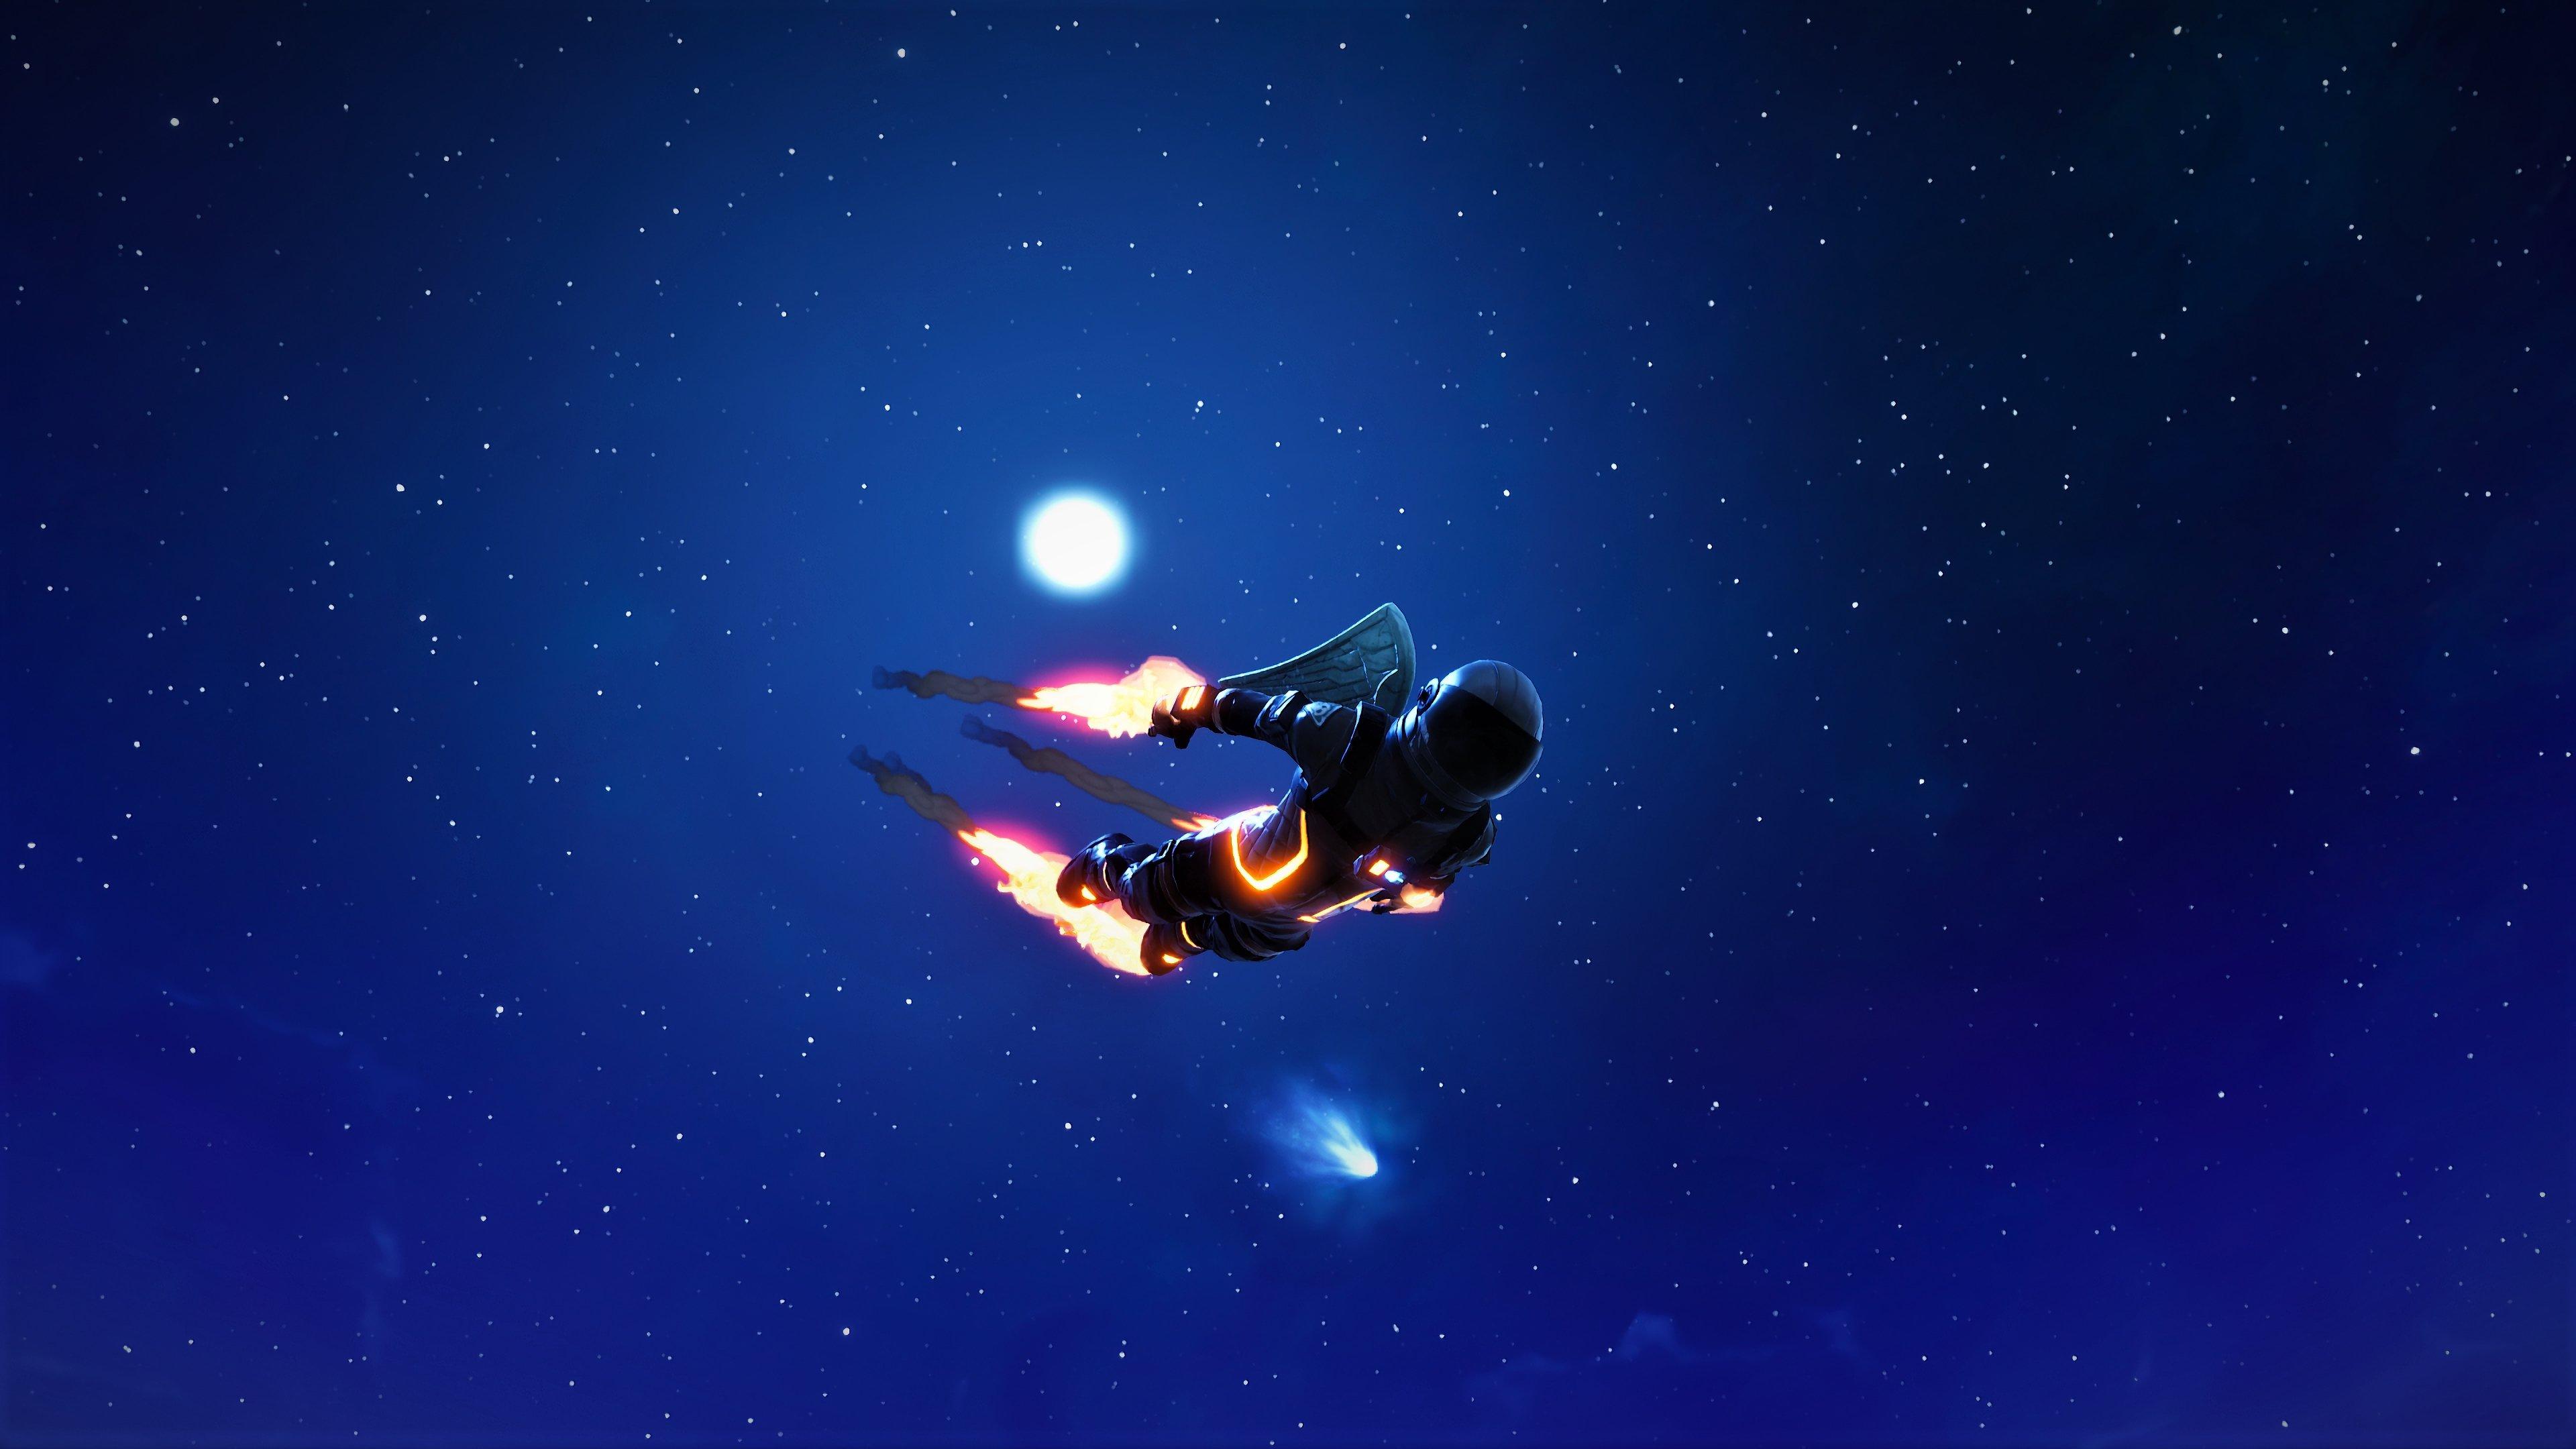 Fondos de pantalla Fortnite Dark Voyager